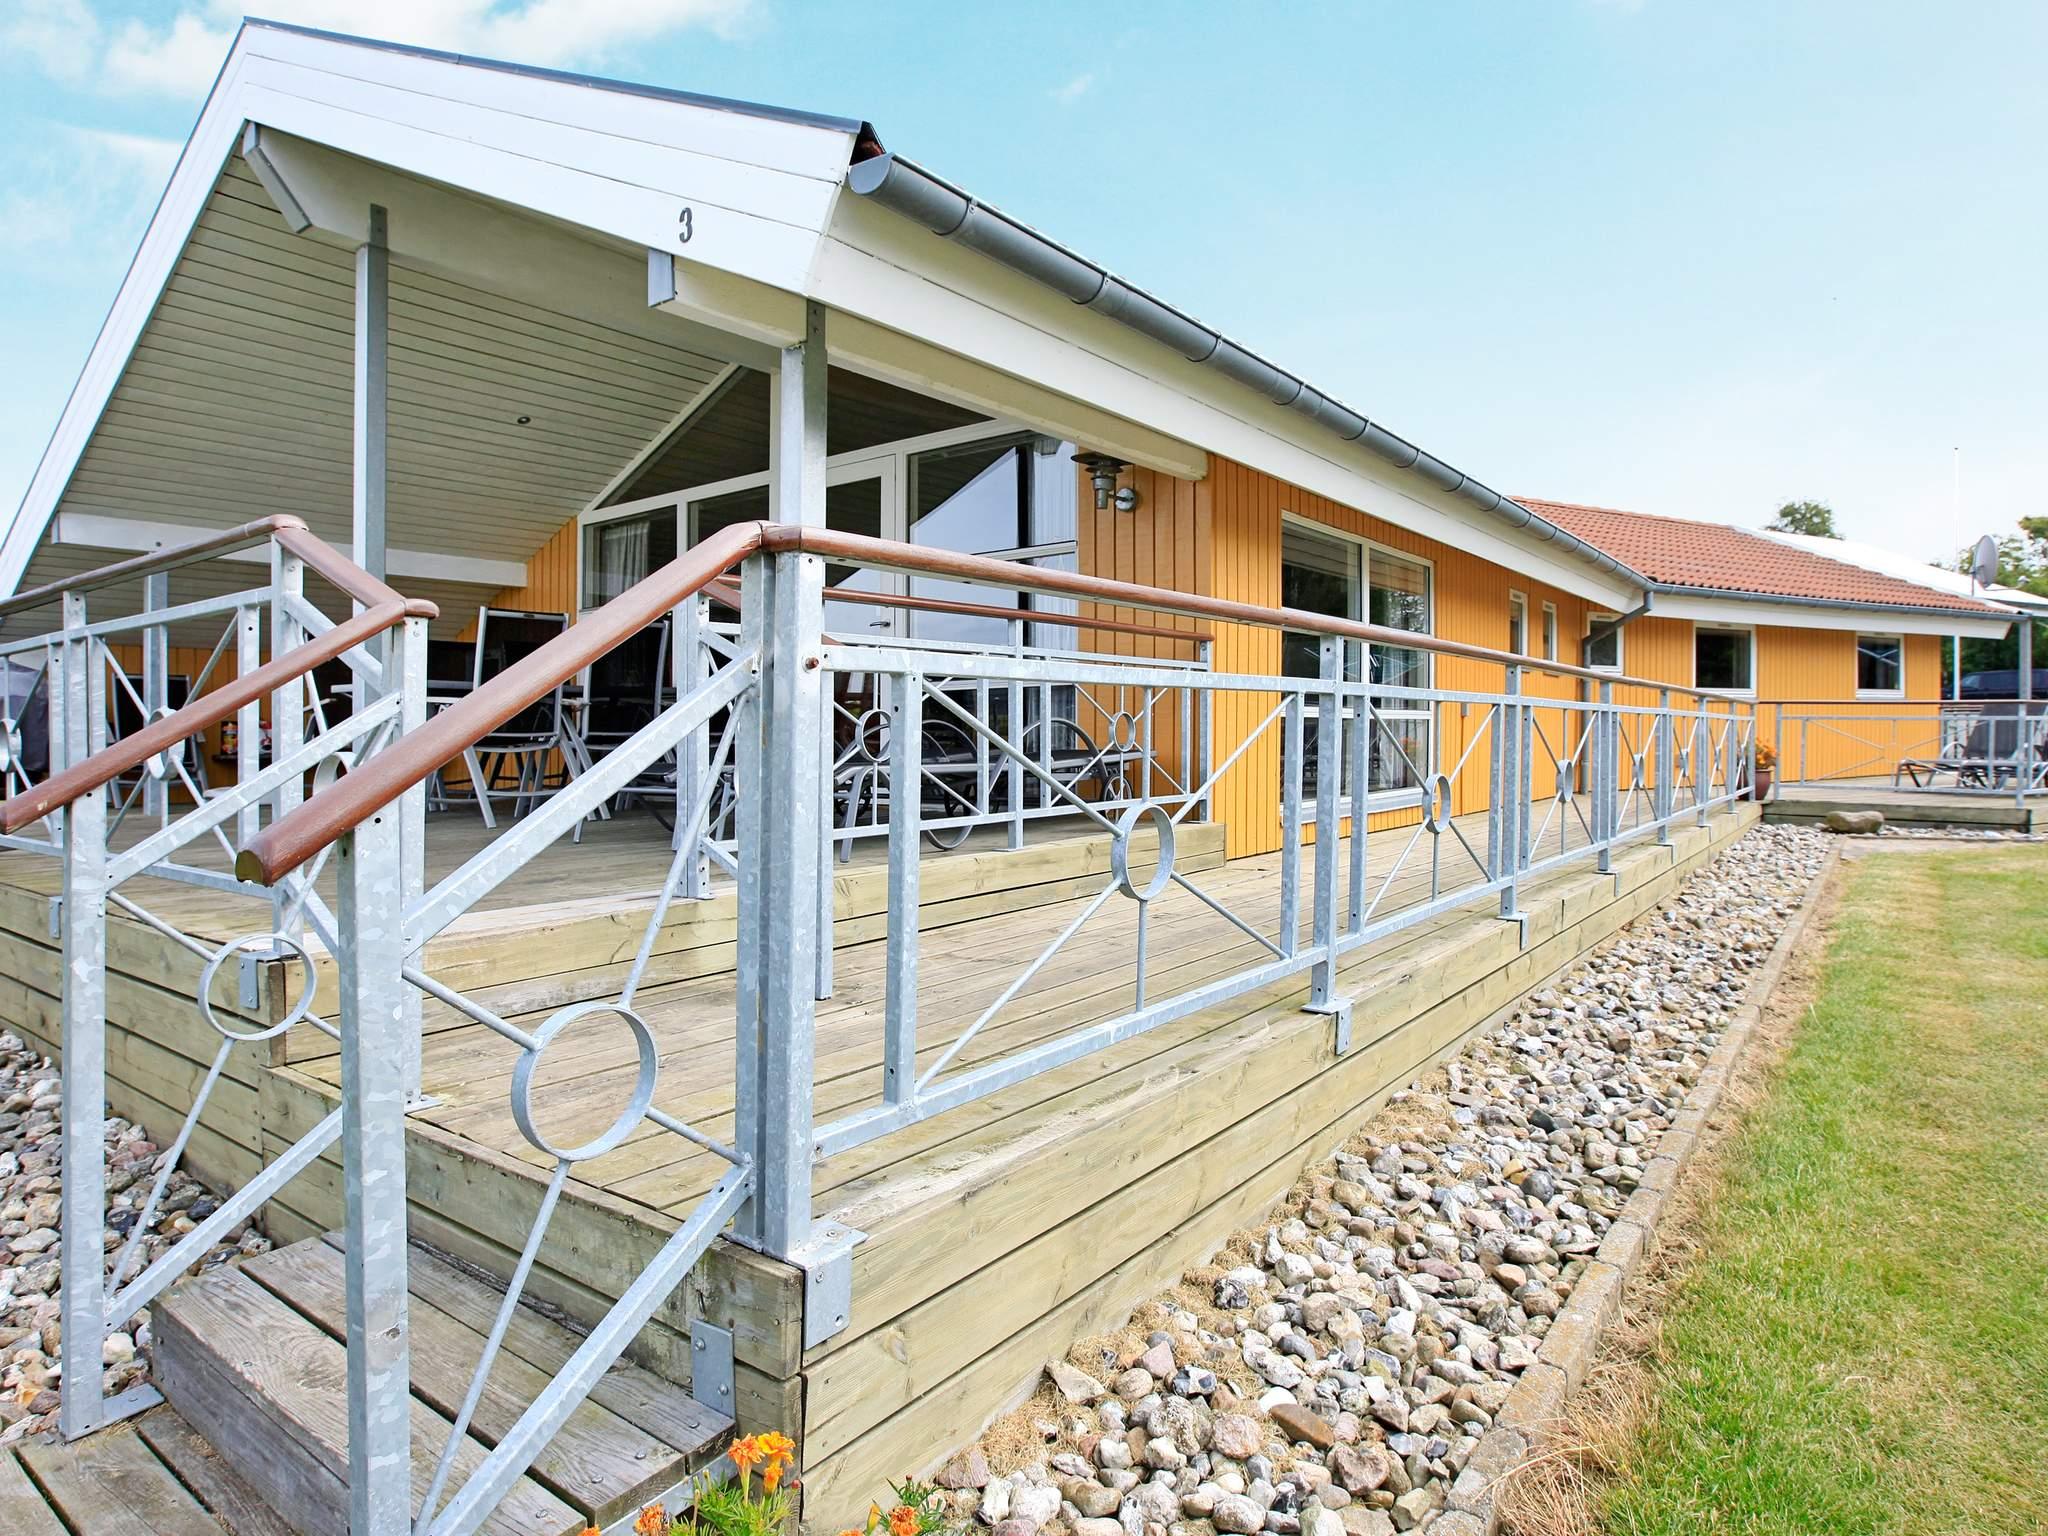 Maison de vacances Falsled (87545), Faldsled, , Fionie, Danemark, image 19